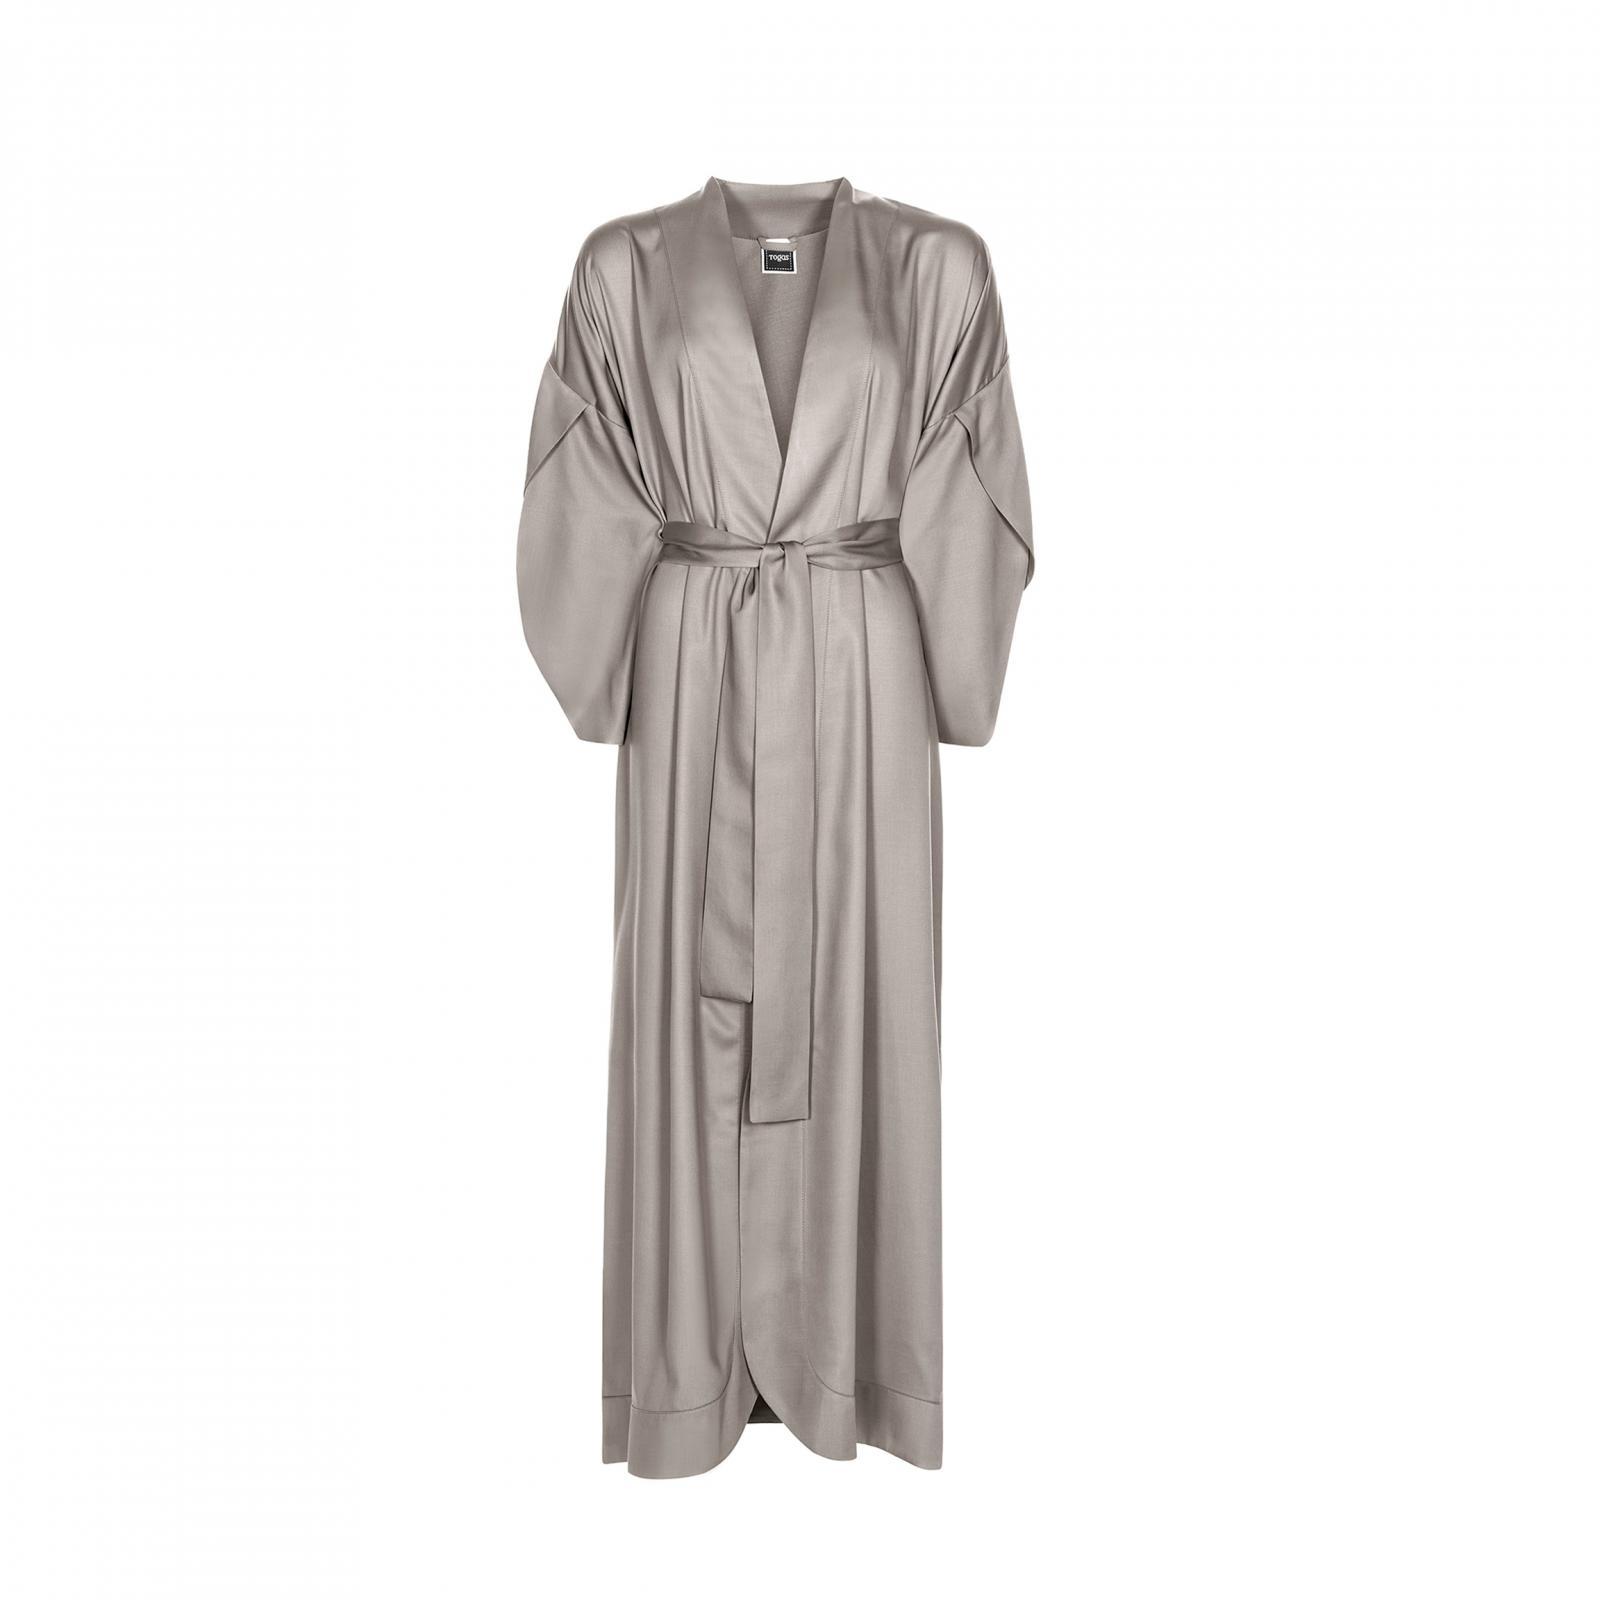 Халат-кимоно Togas Наоми серо-коричневый M (46) халат m 46 togas селеста